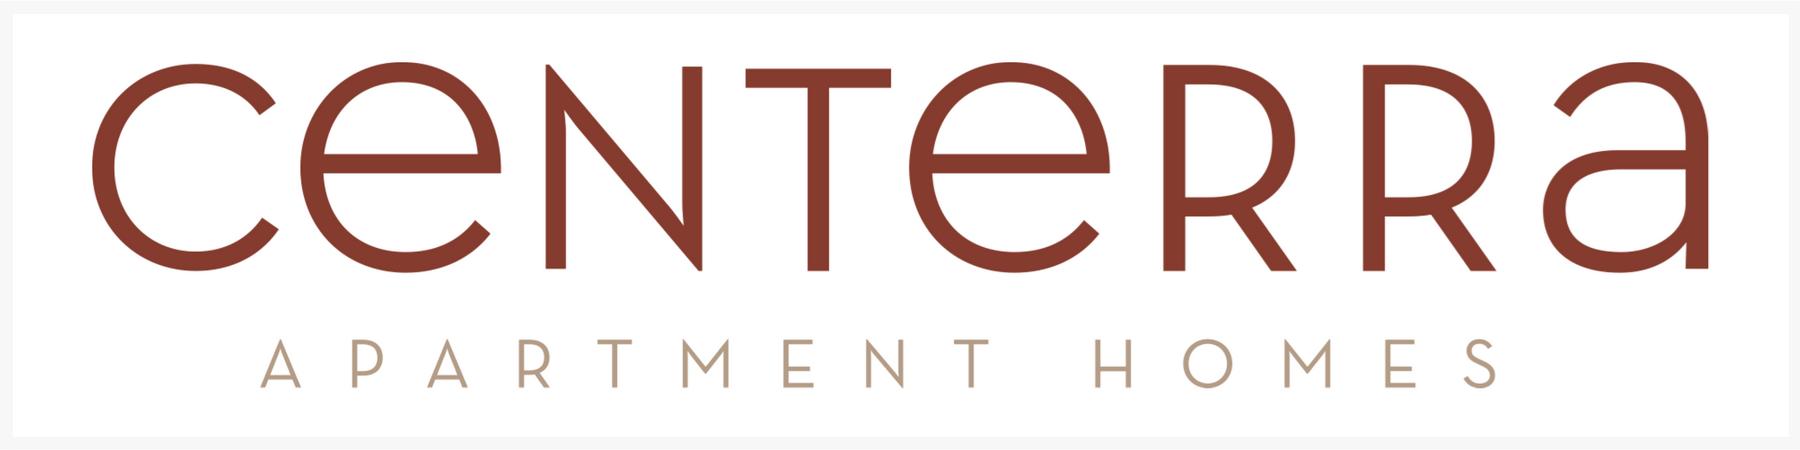 Centerra Property Logo 15